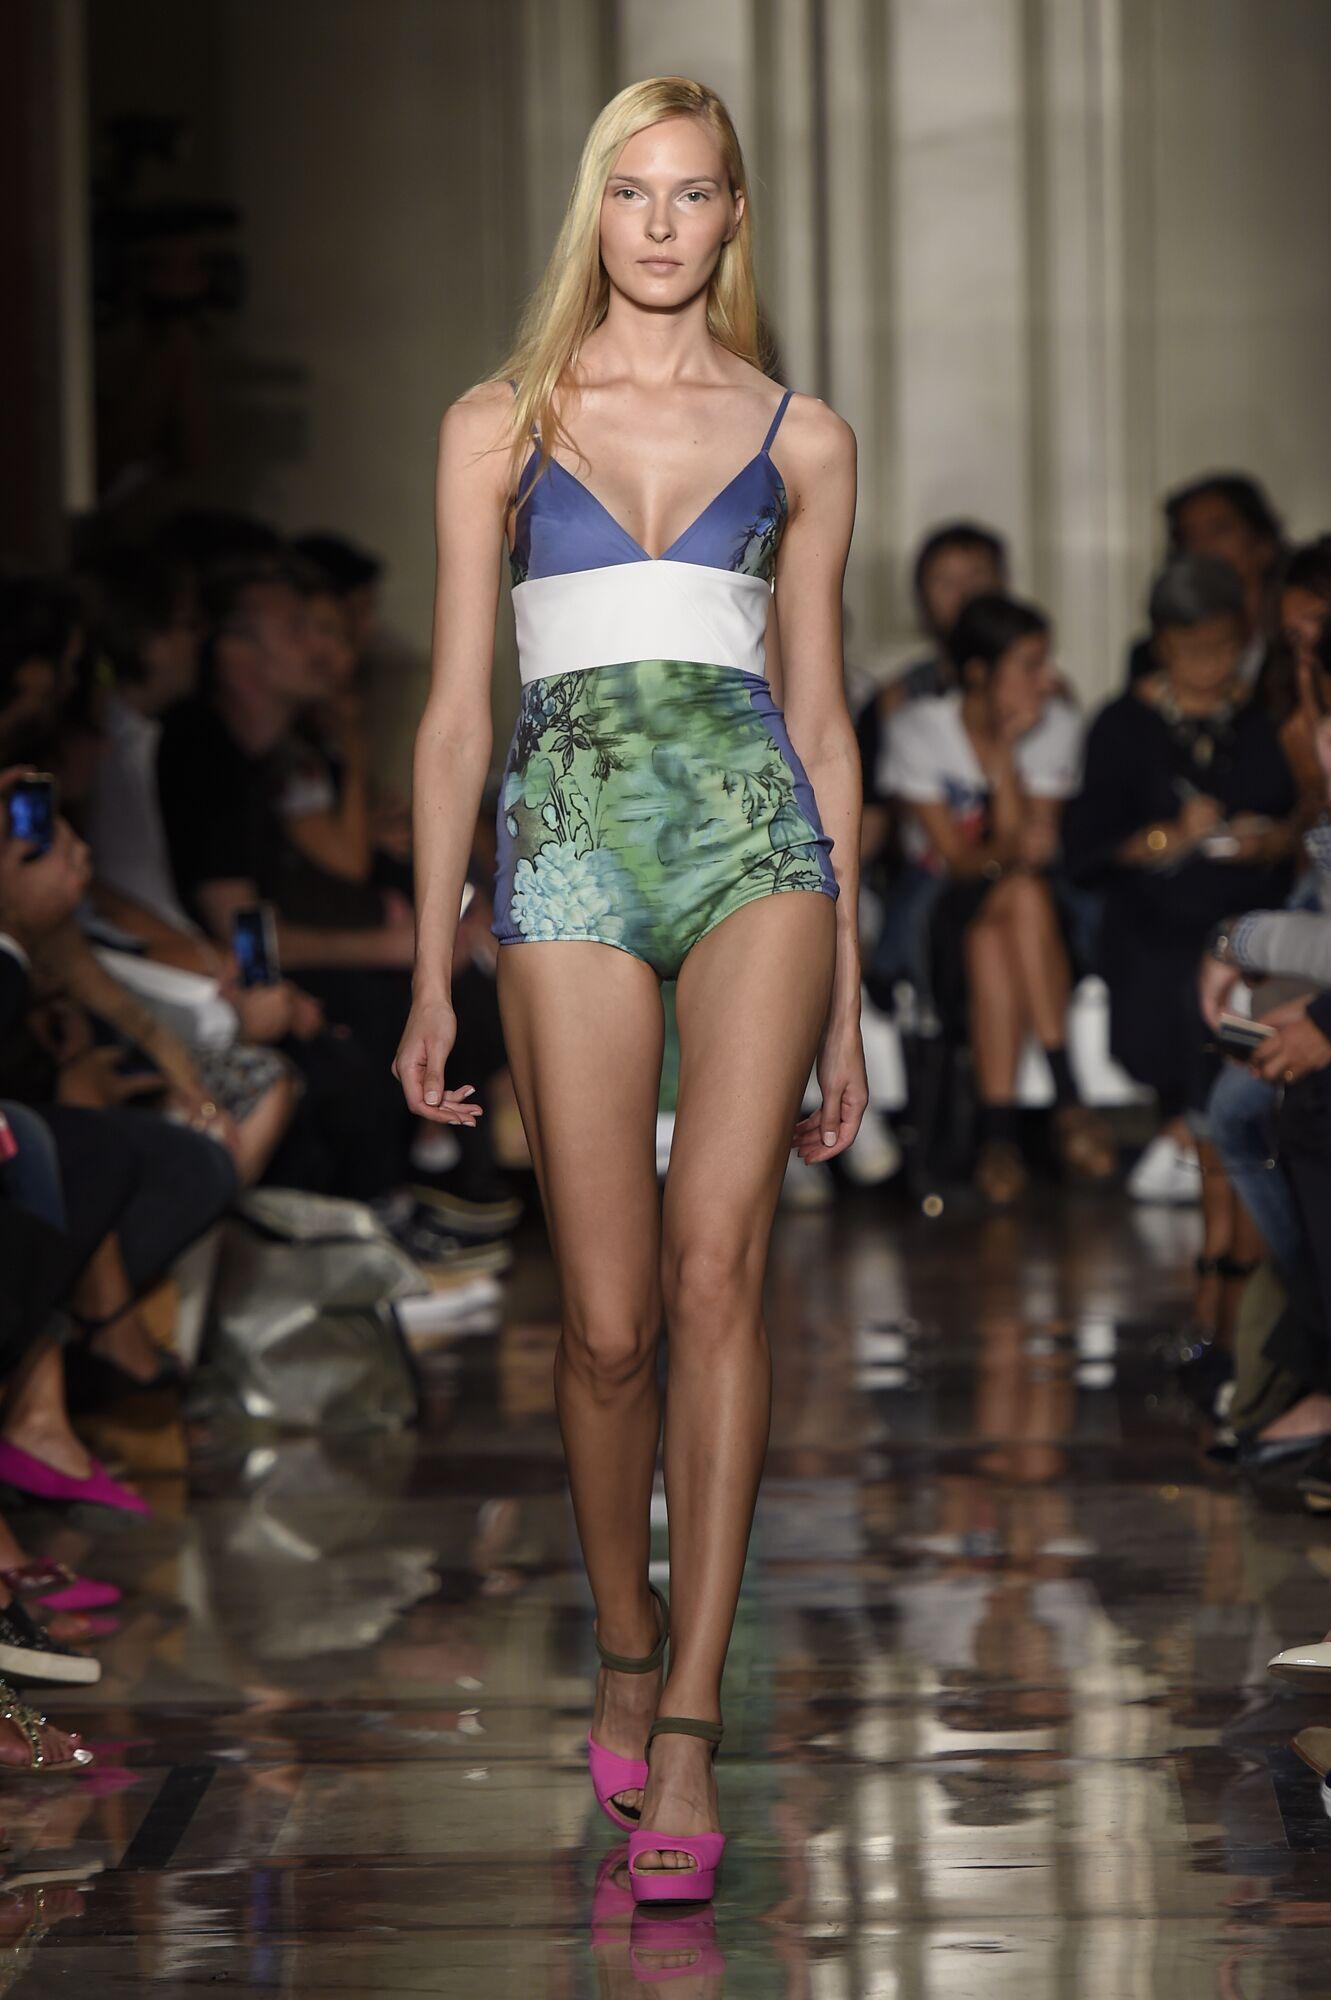 Spring Summer 2015 Fashion Model Andrea Incontri Collection